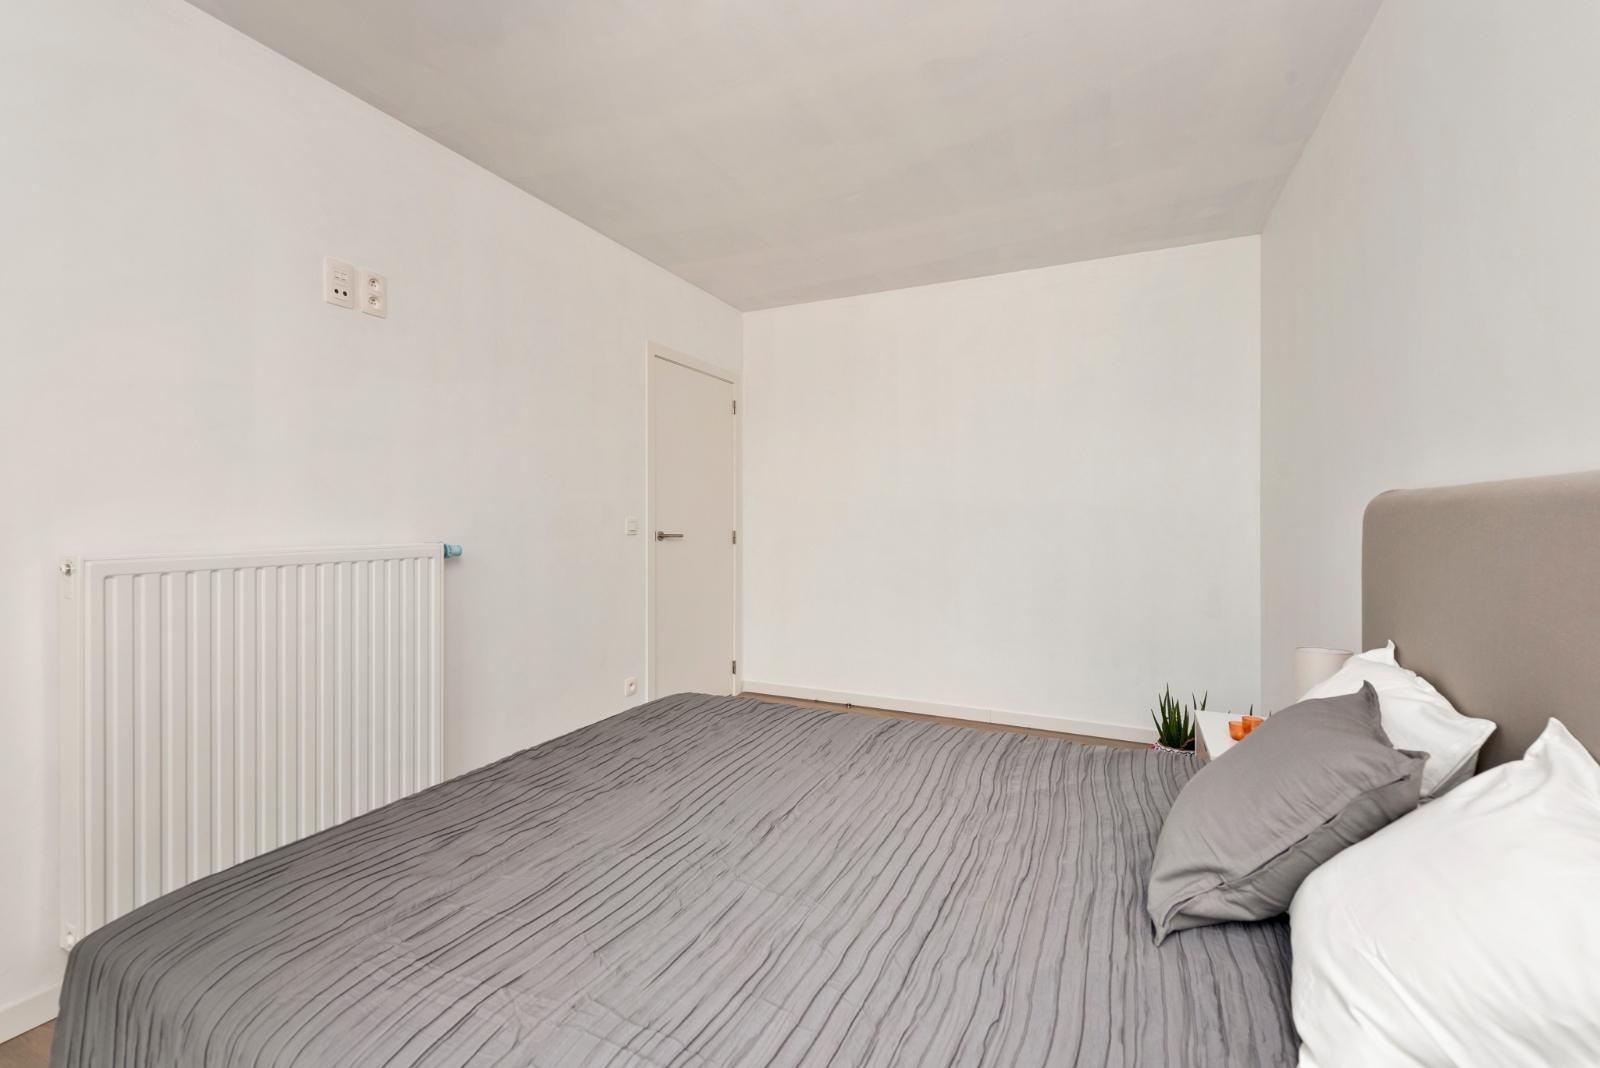 Prachtig appartement met super ruim terras in centrum Diksmuide - 5